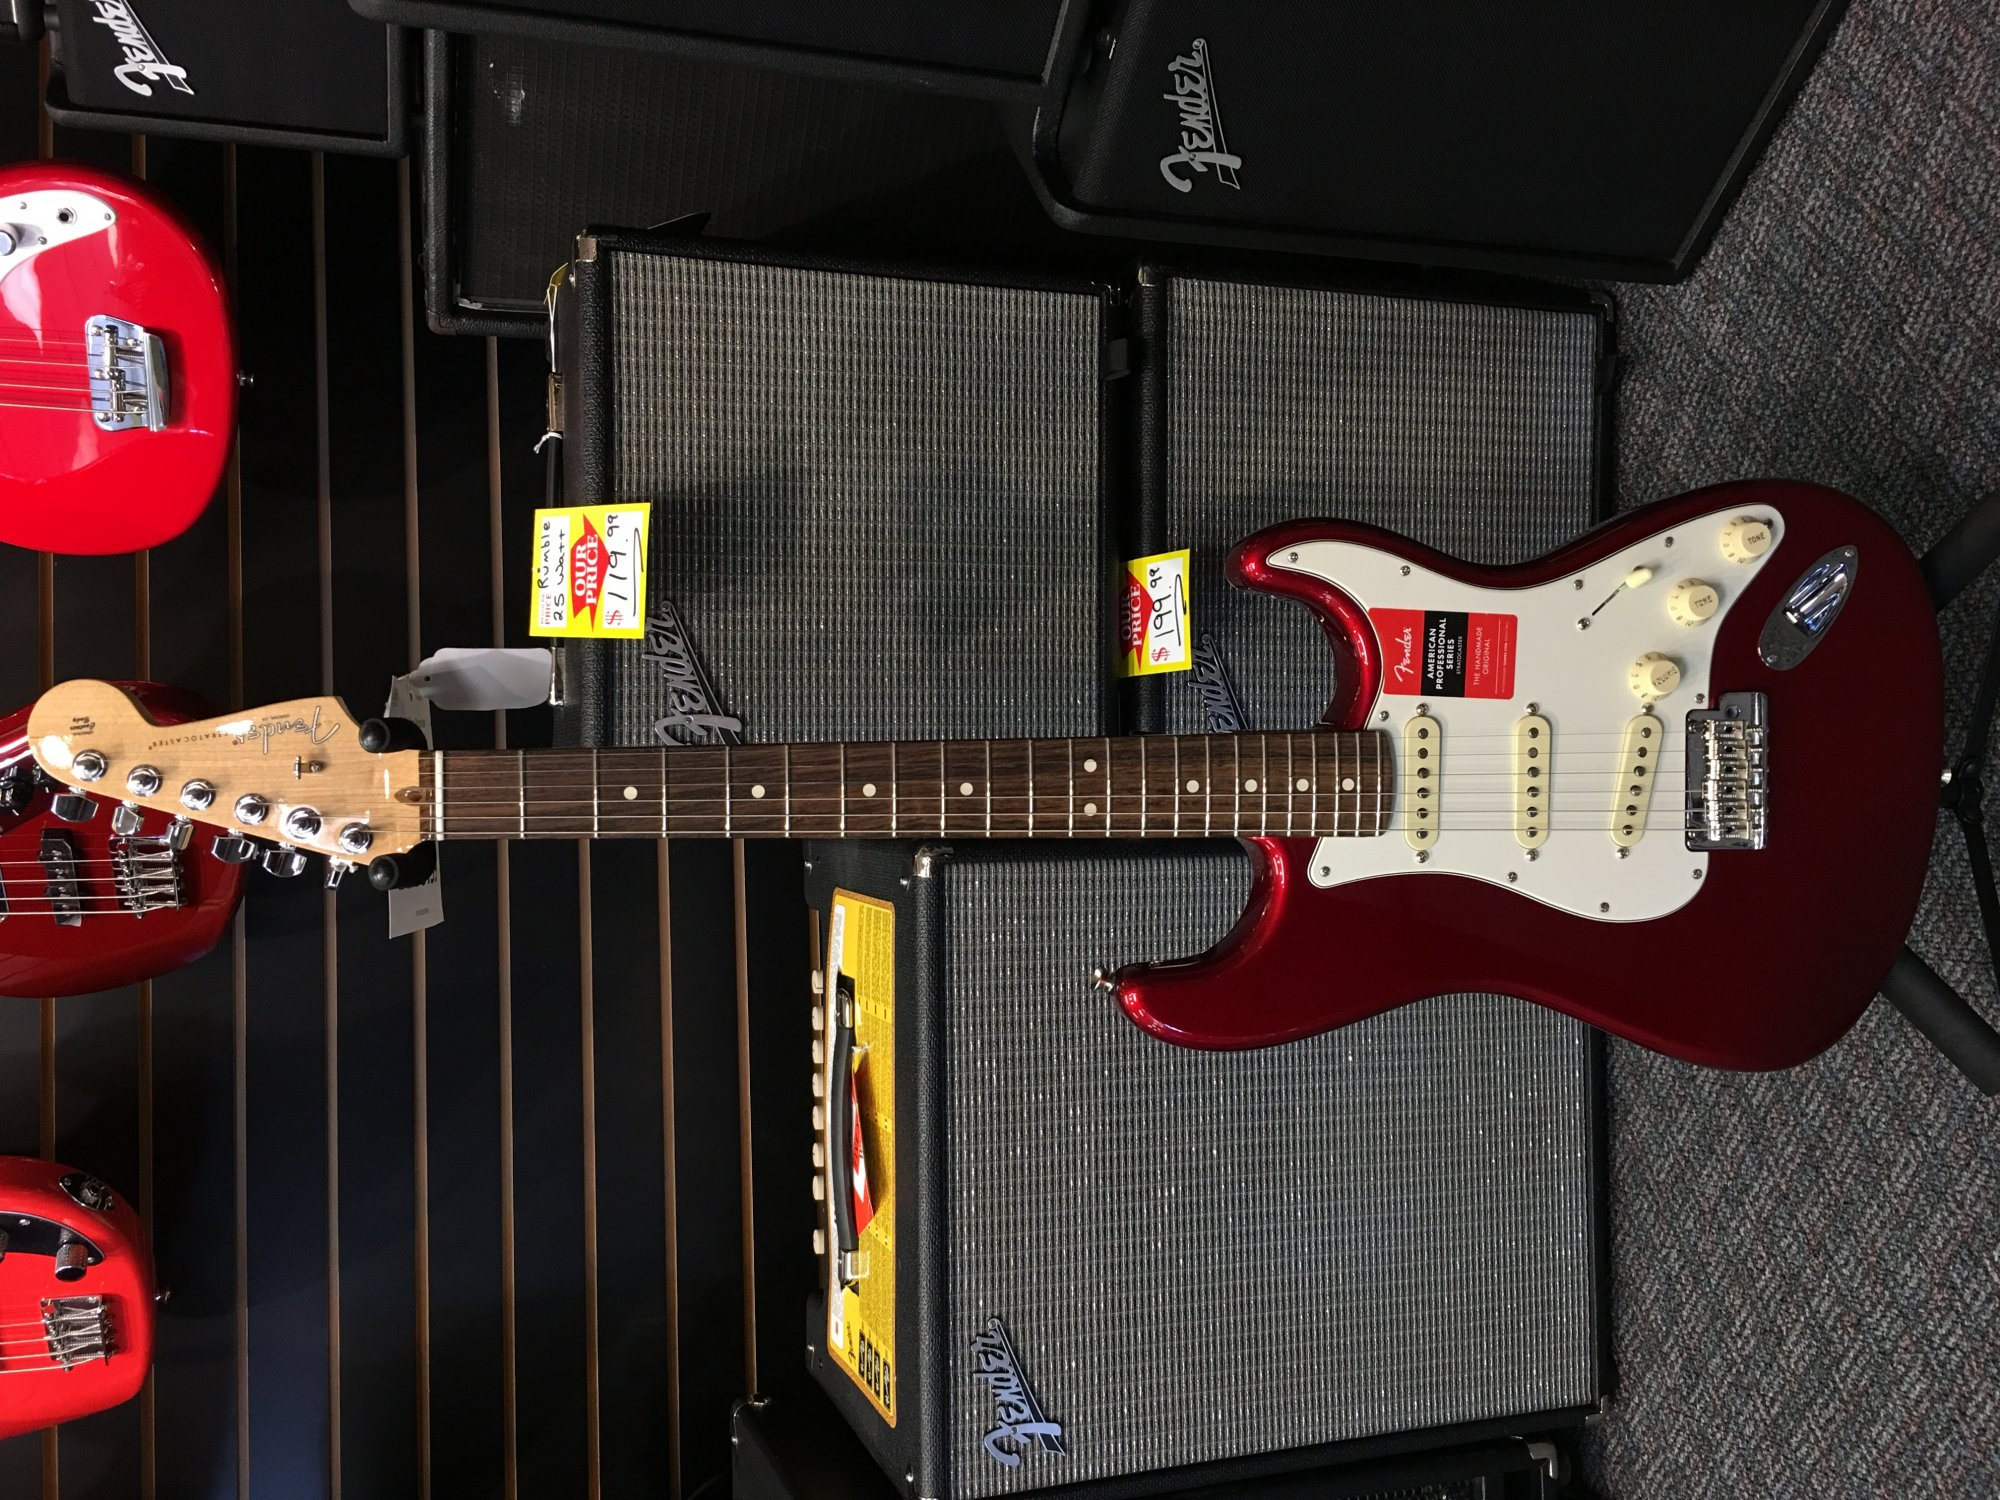 Fender Stratocaster Professional Guitar